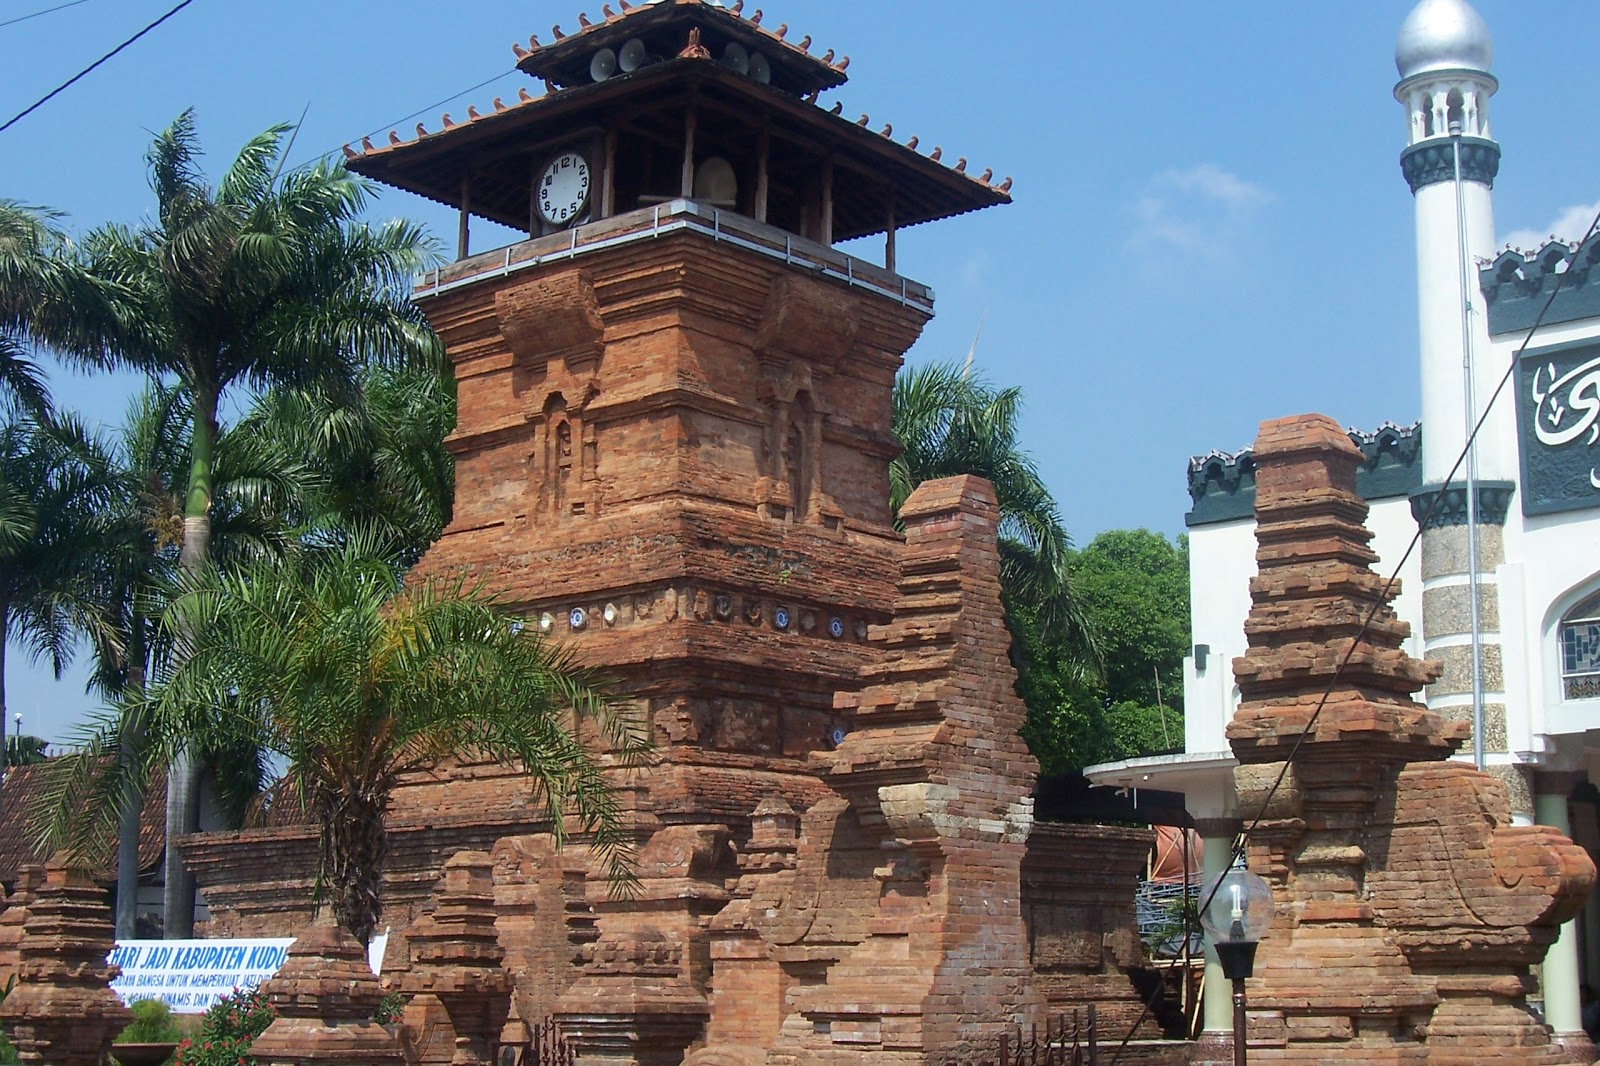 Kudus Indonesia  city images : Perkembangan Agama Islam di Indonesia